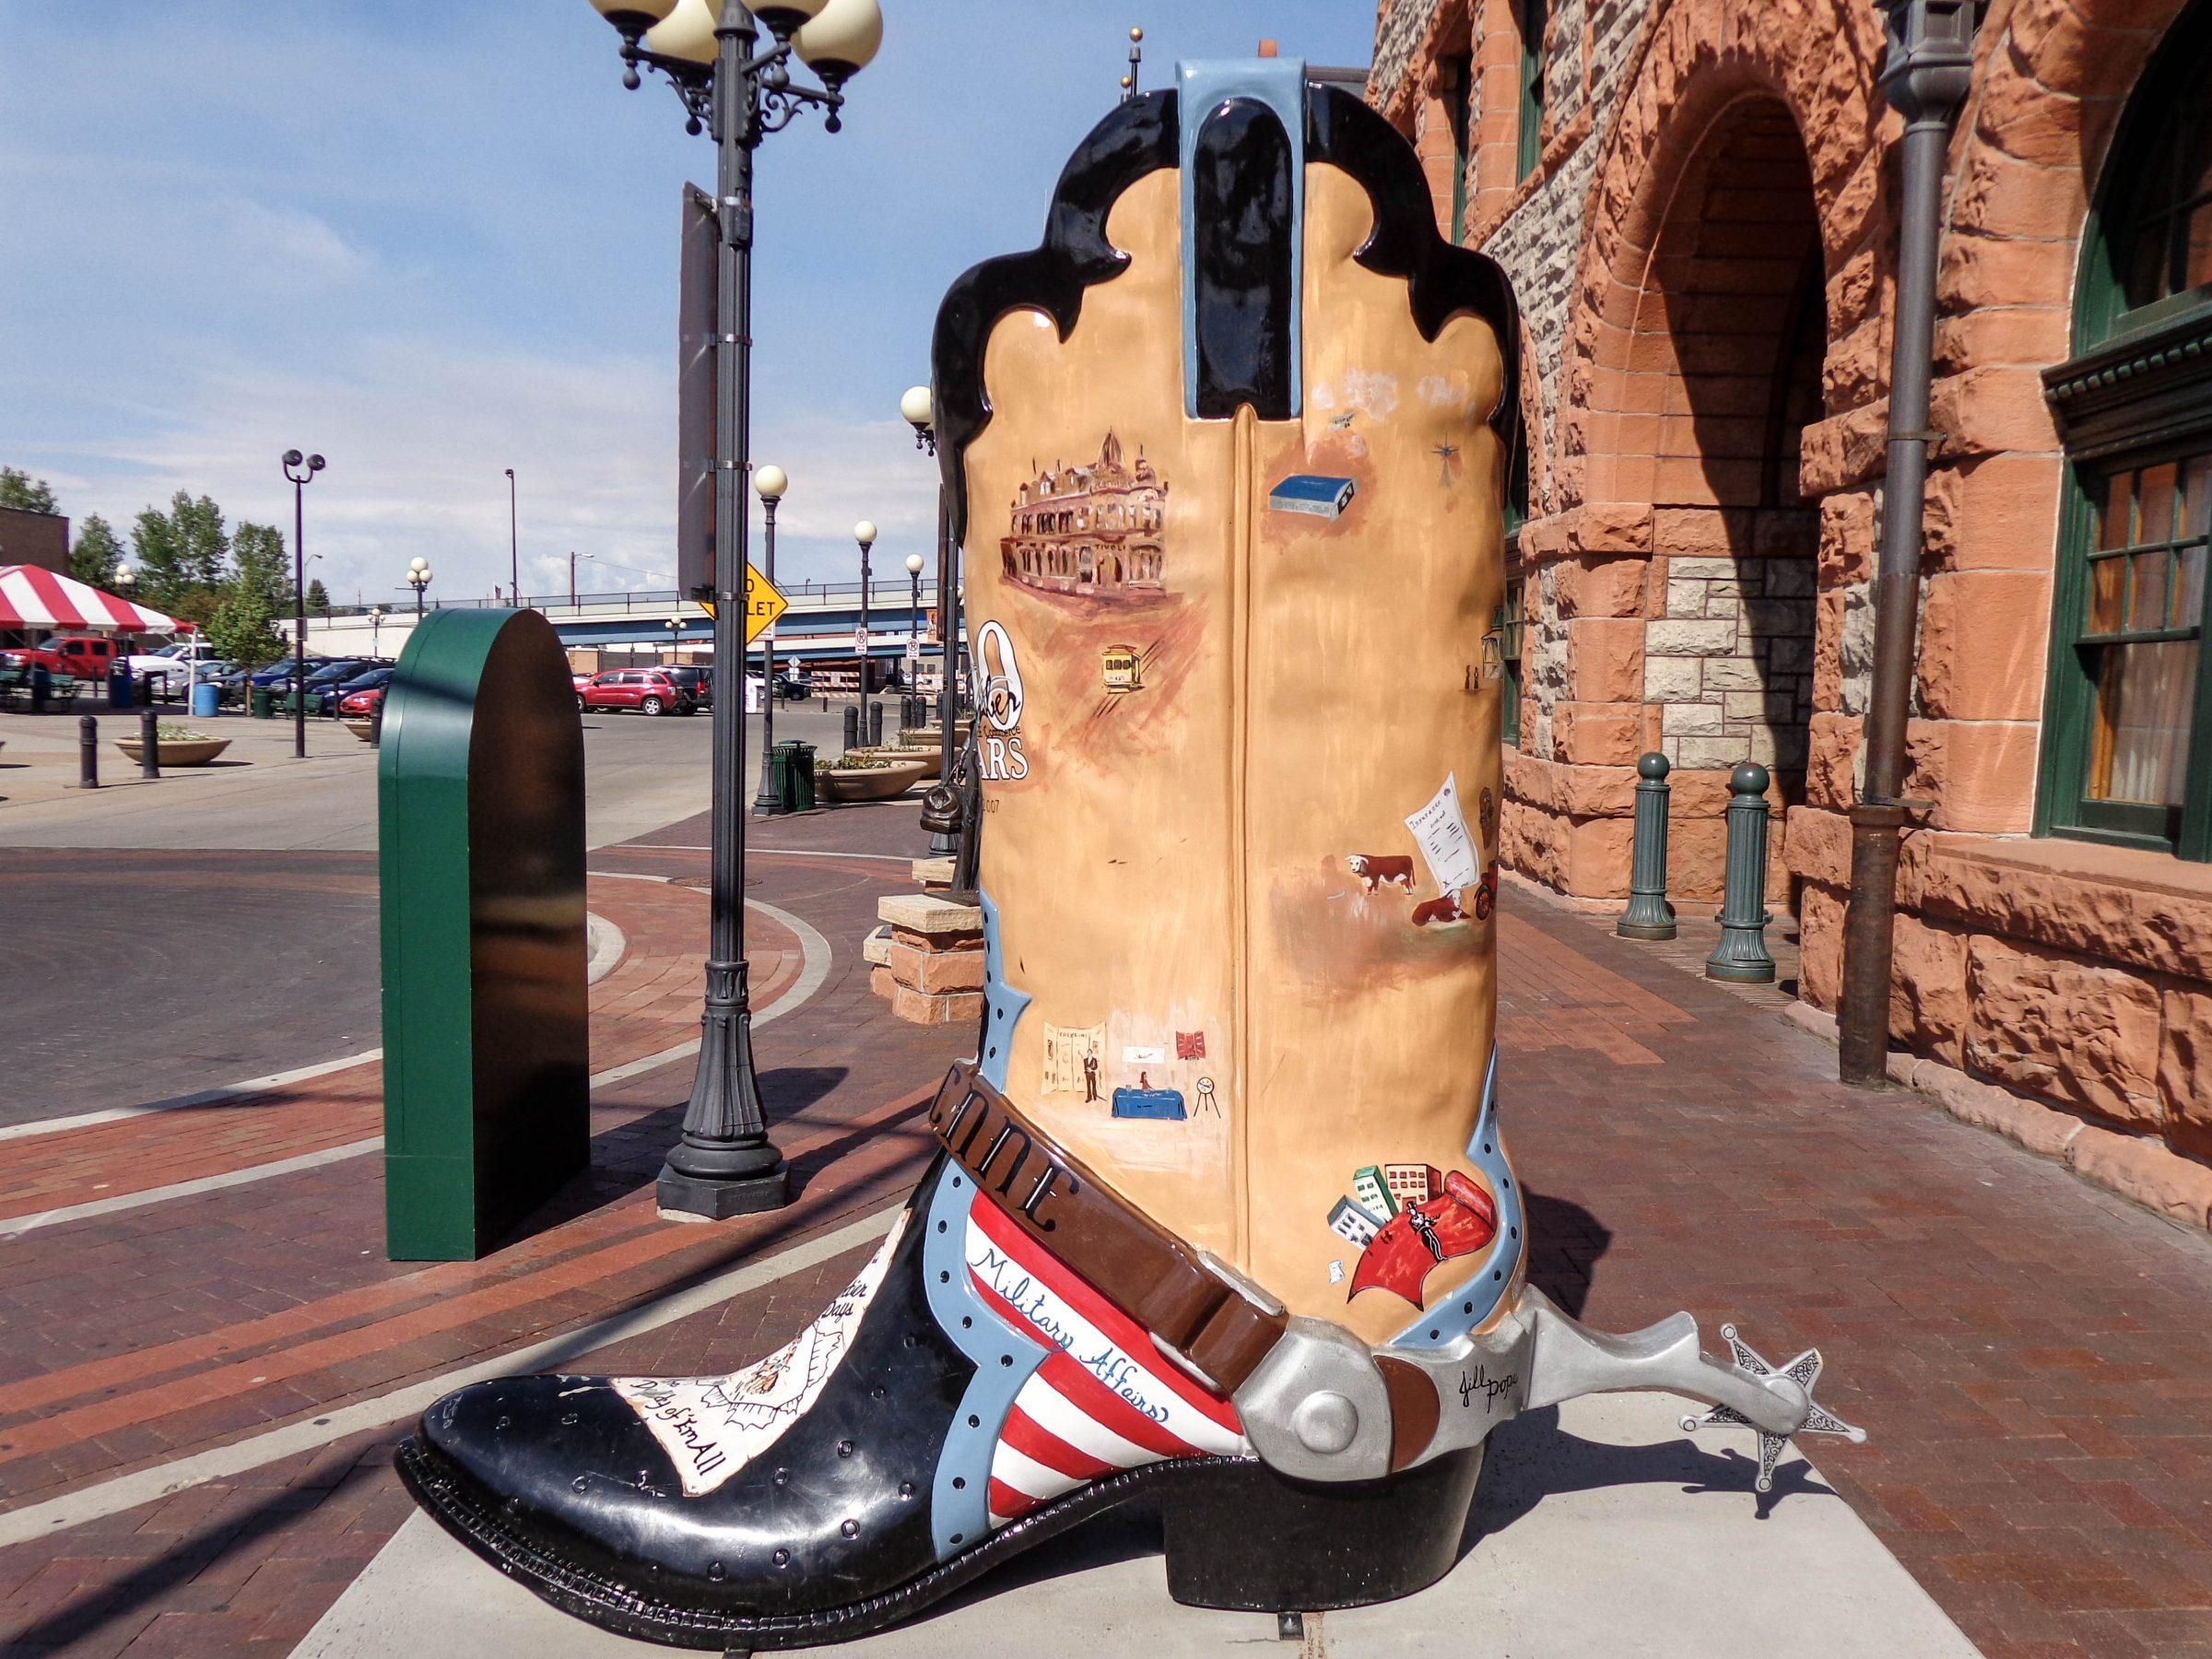 Een cowboylaars in Cheyenne